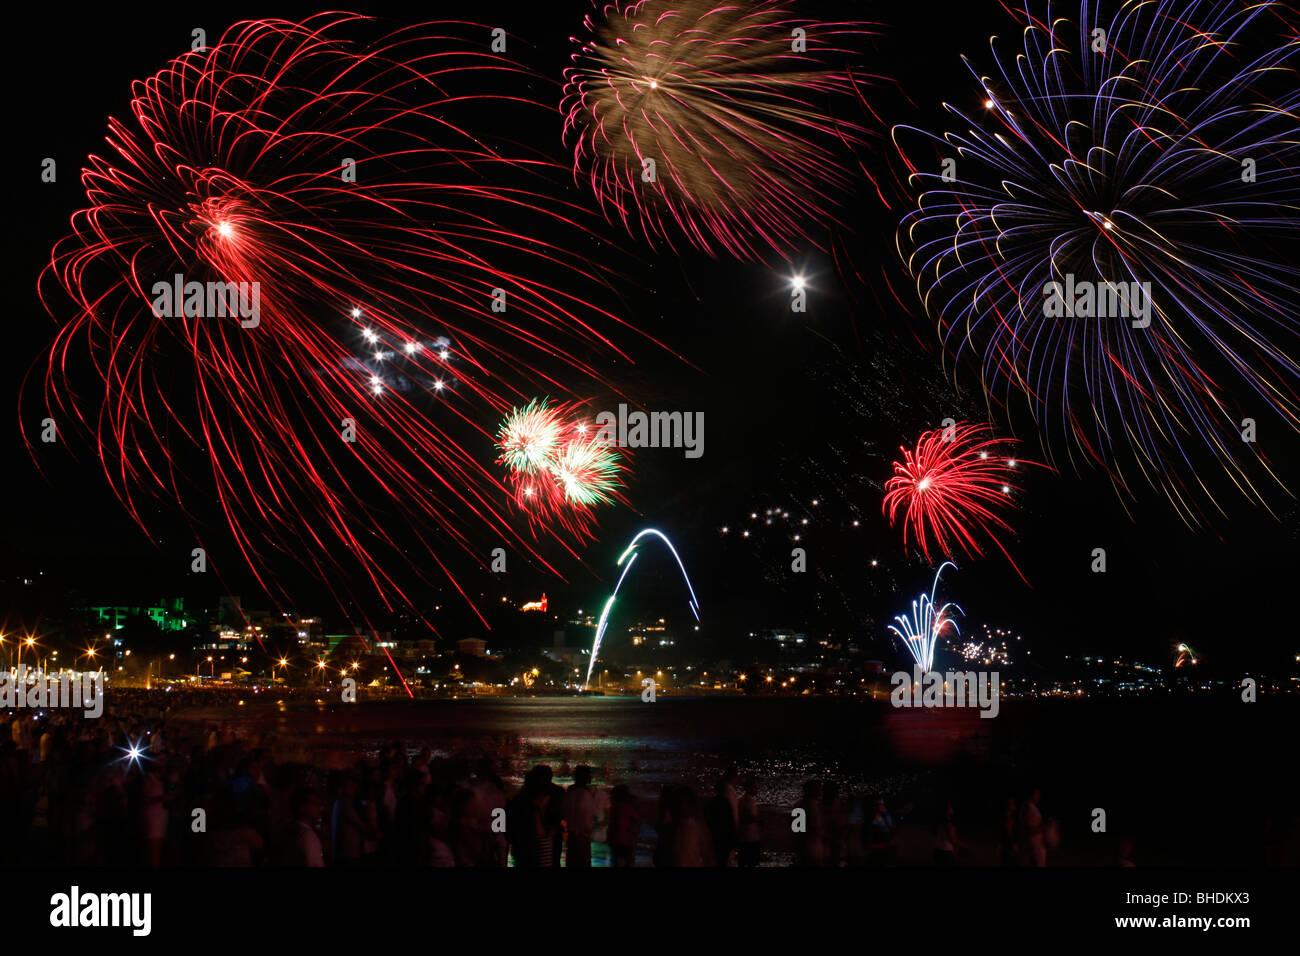 Fireworks celebrating new year on the beach of Bombinhas in Brazil - Stock Image